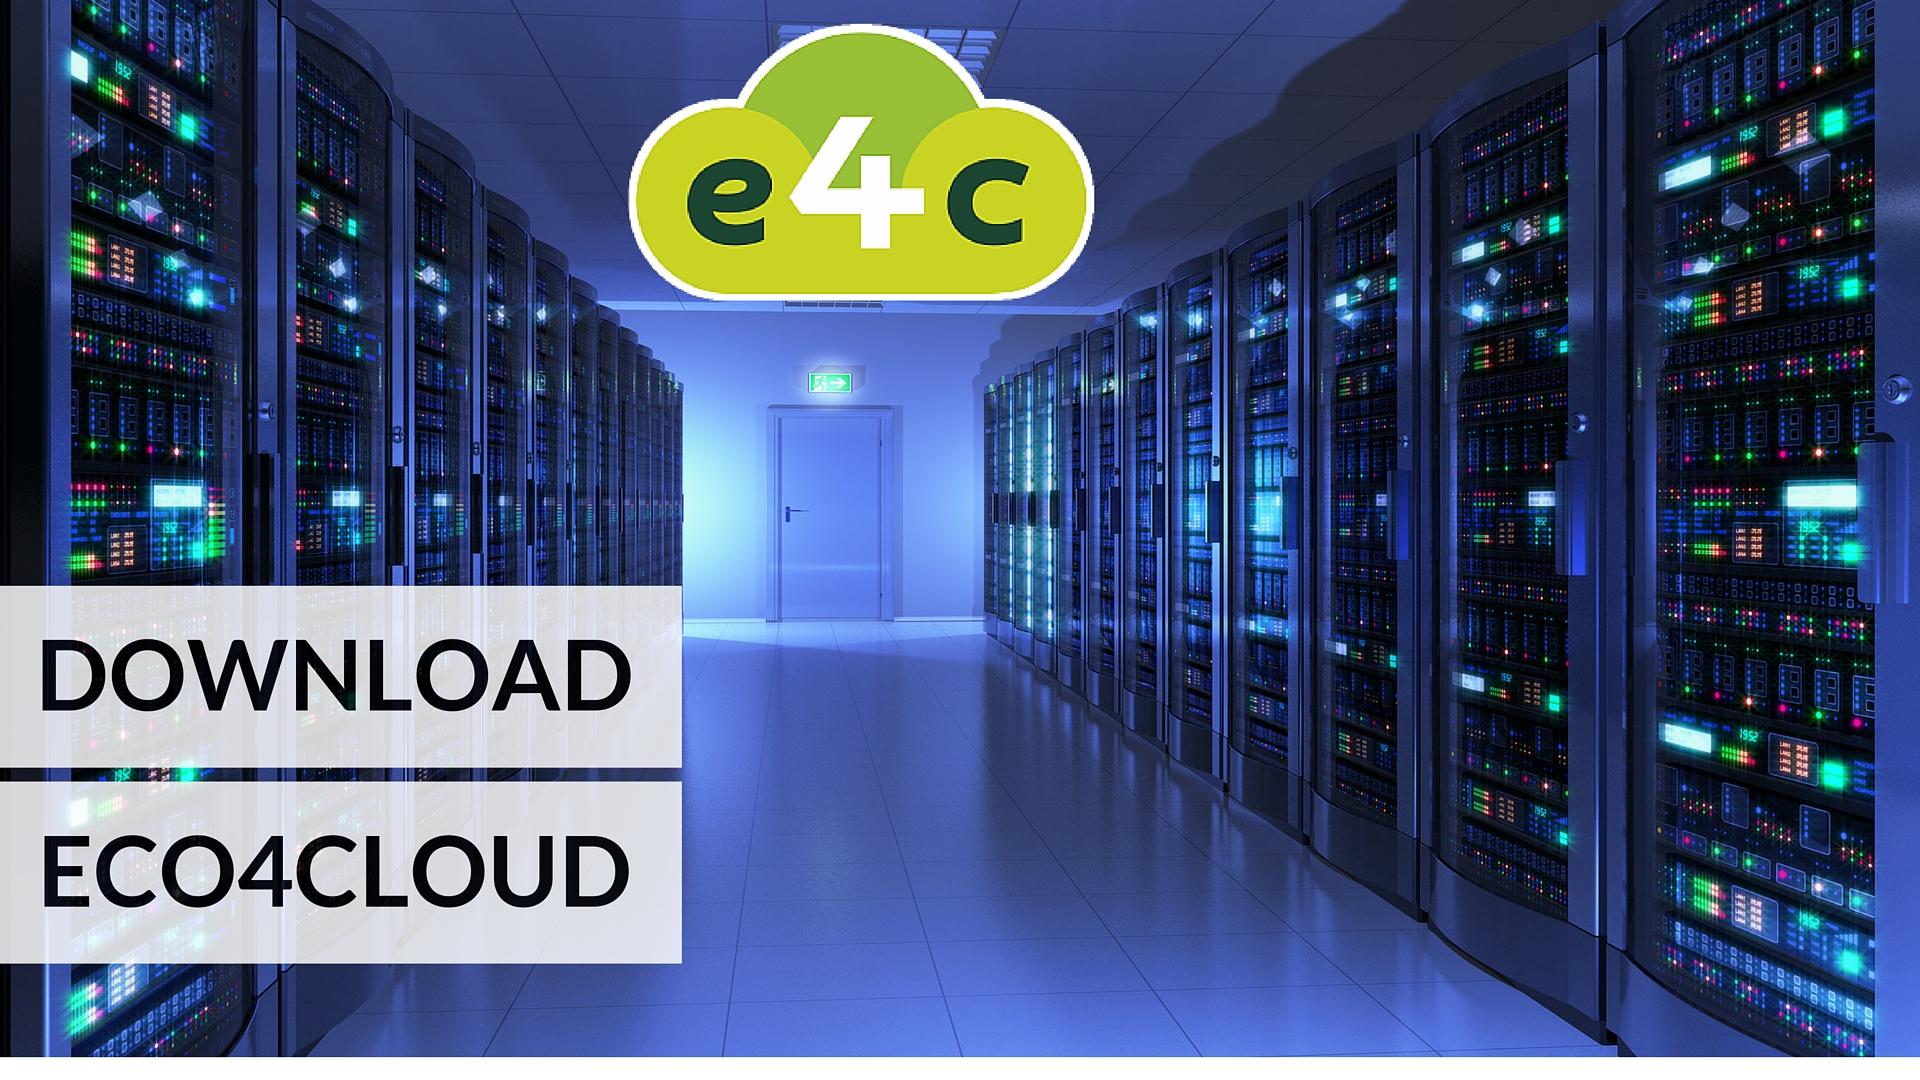 downloadE4C